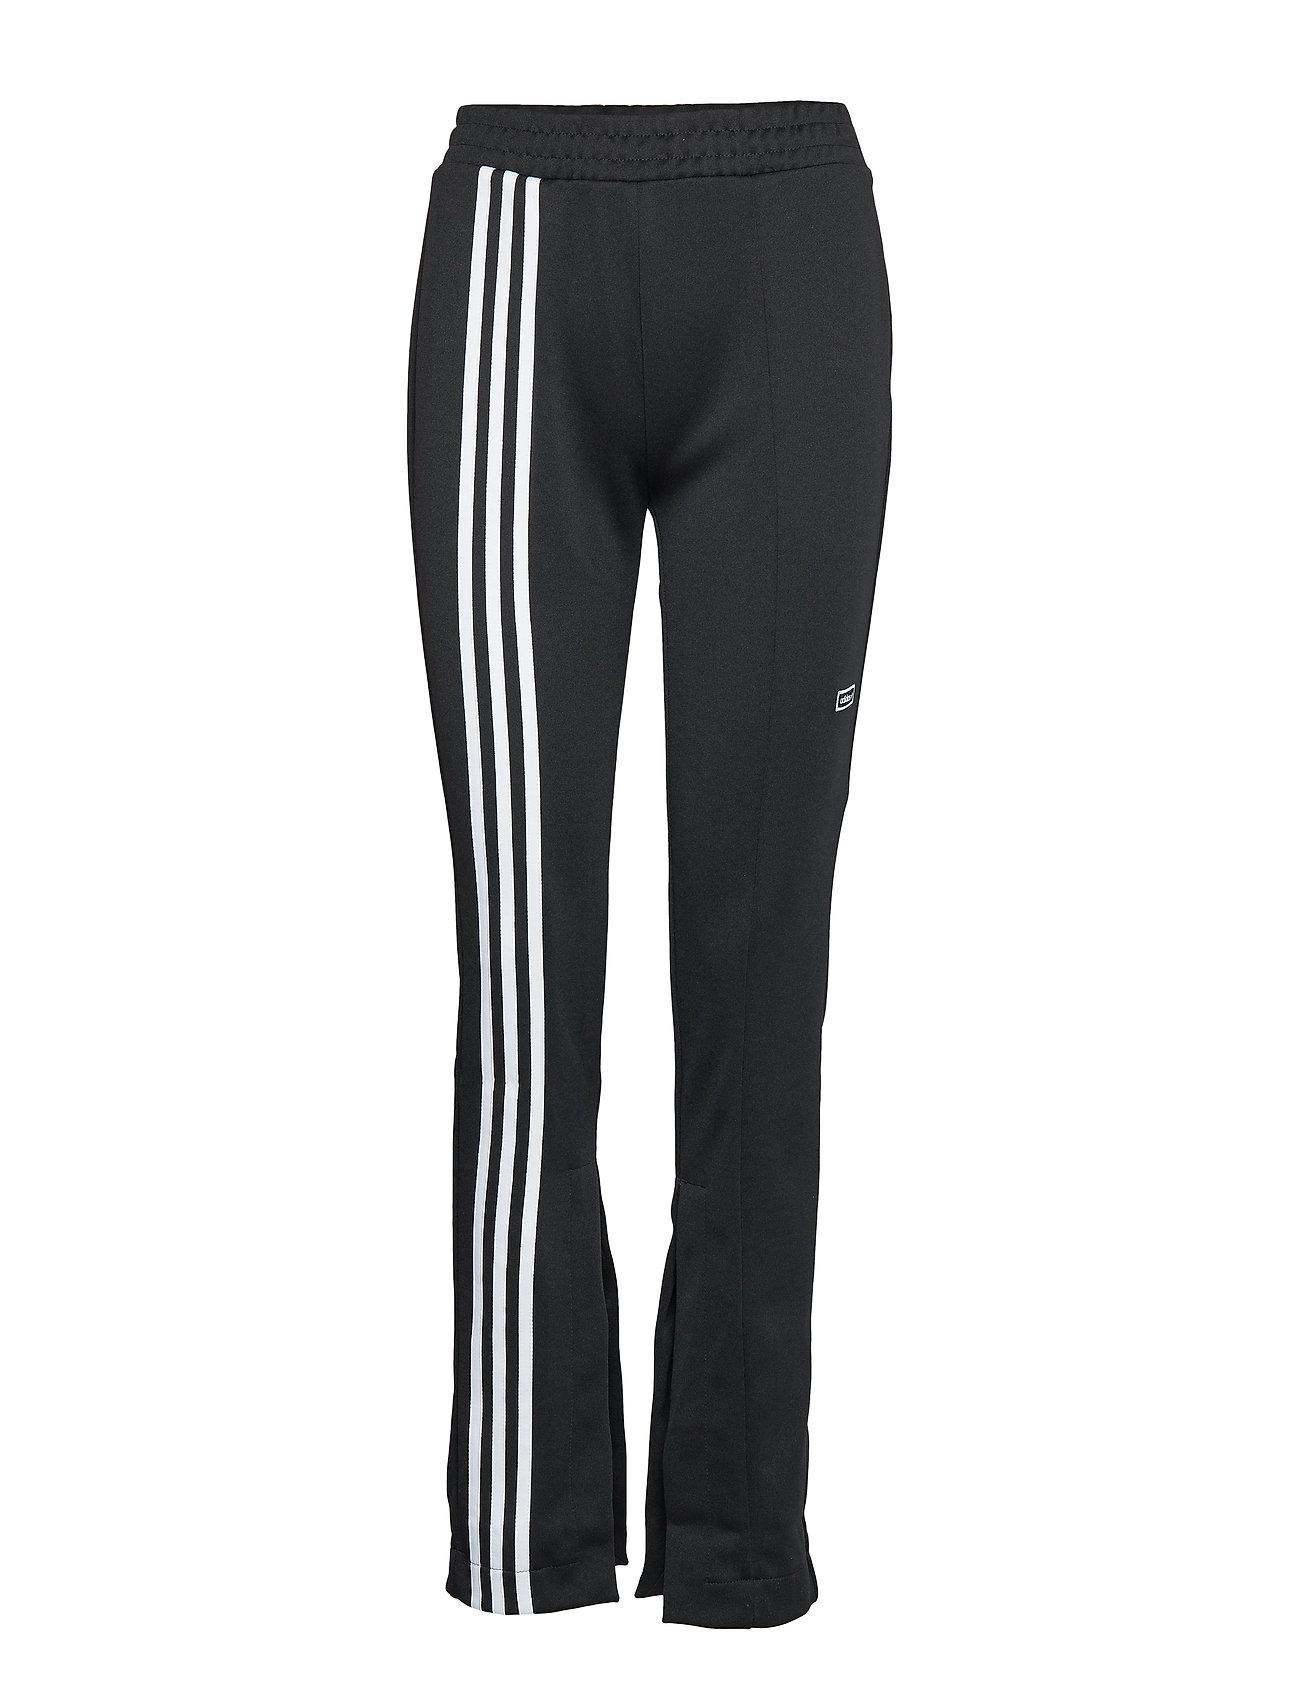 adidas Originals TLRD TRACK PANT - BLACK